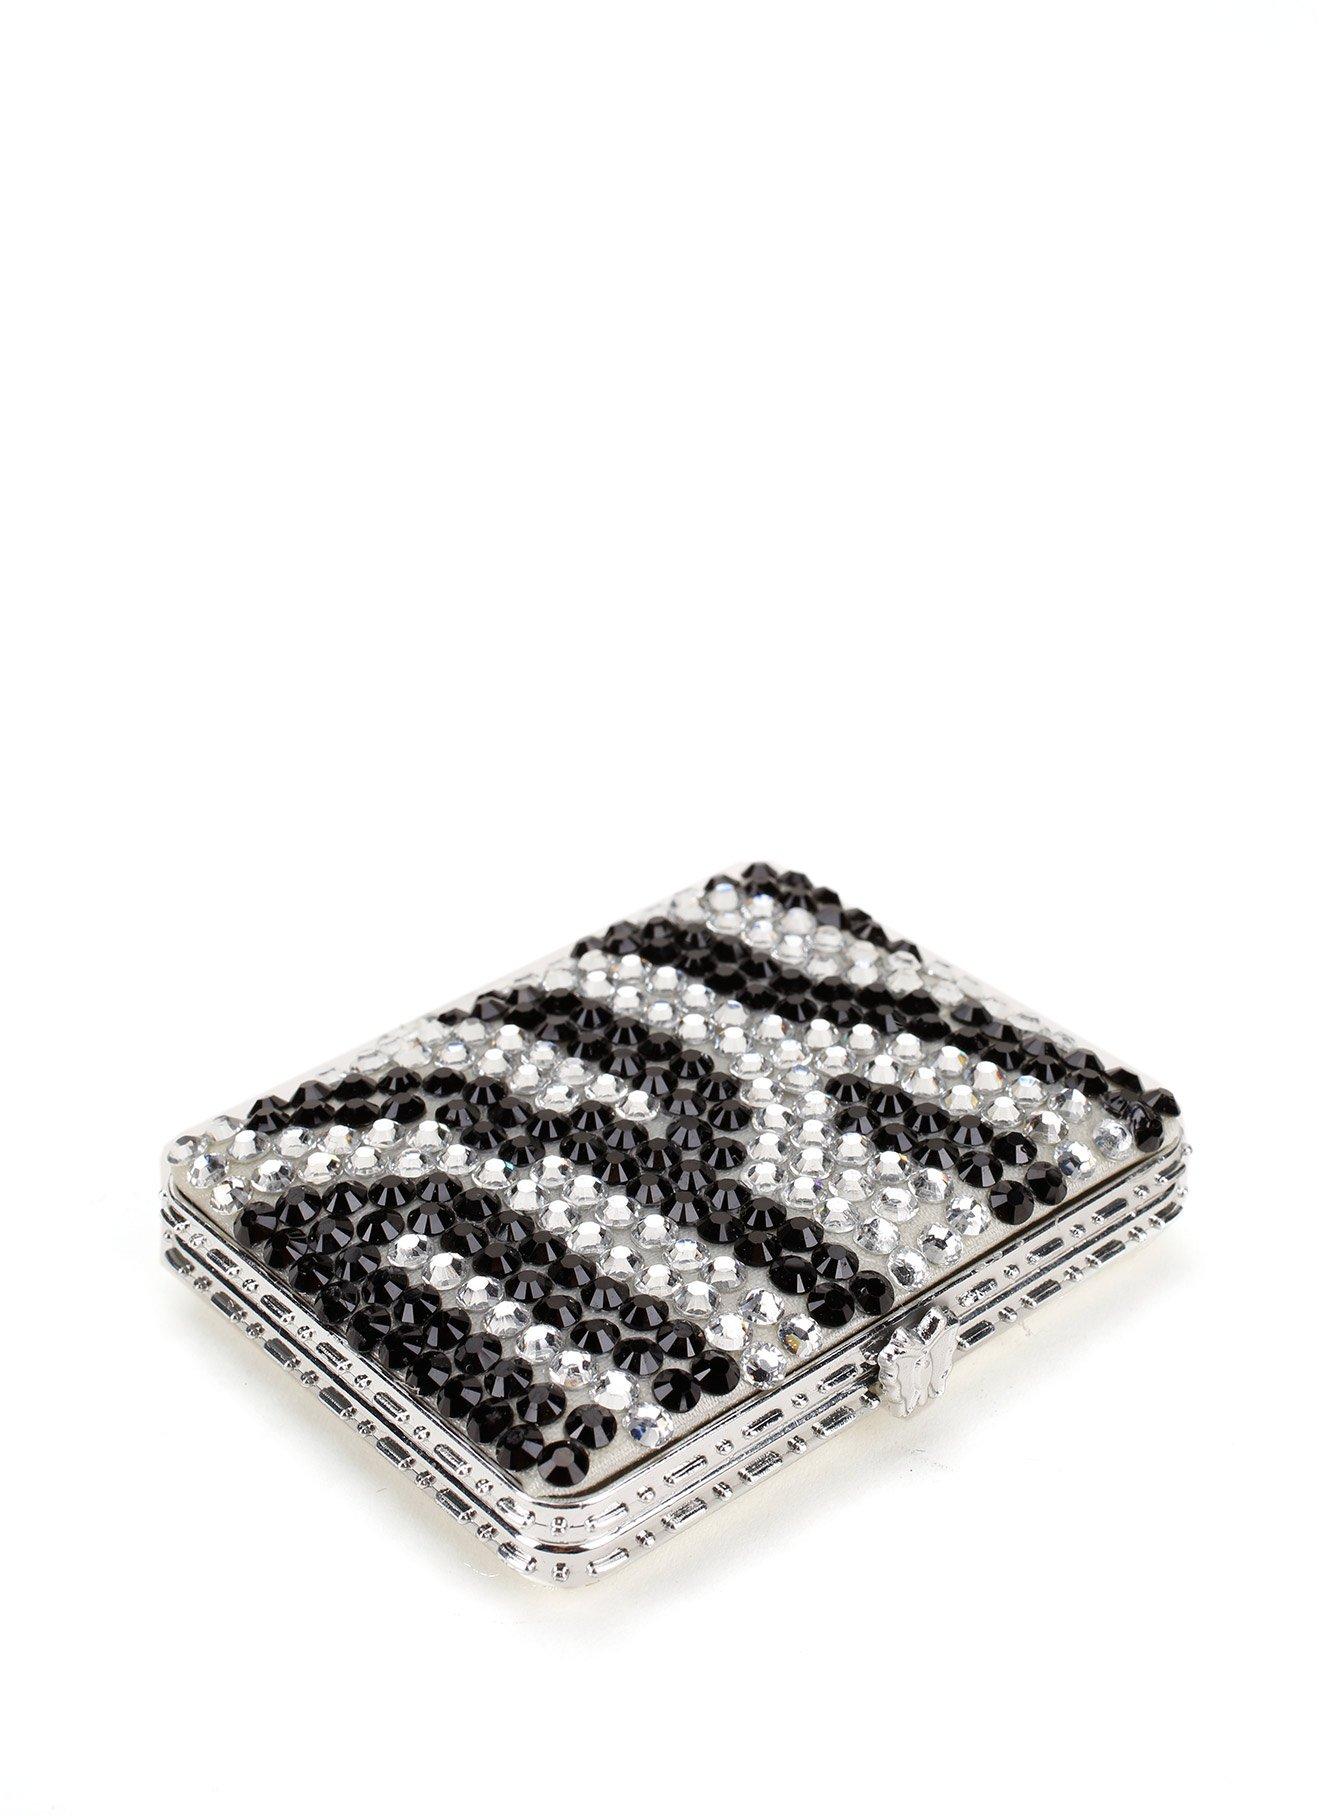 Rectangular Rhinestone Compact Mirror with Zebra Pattern Design